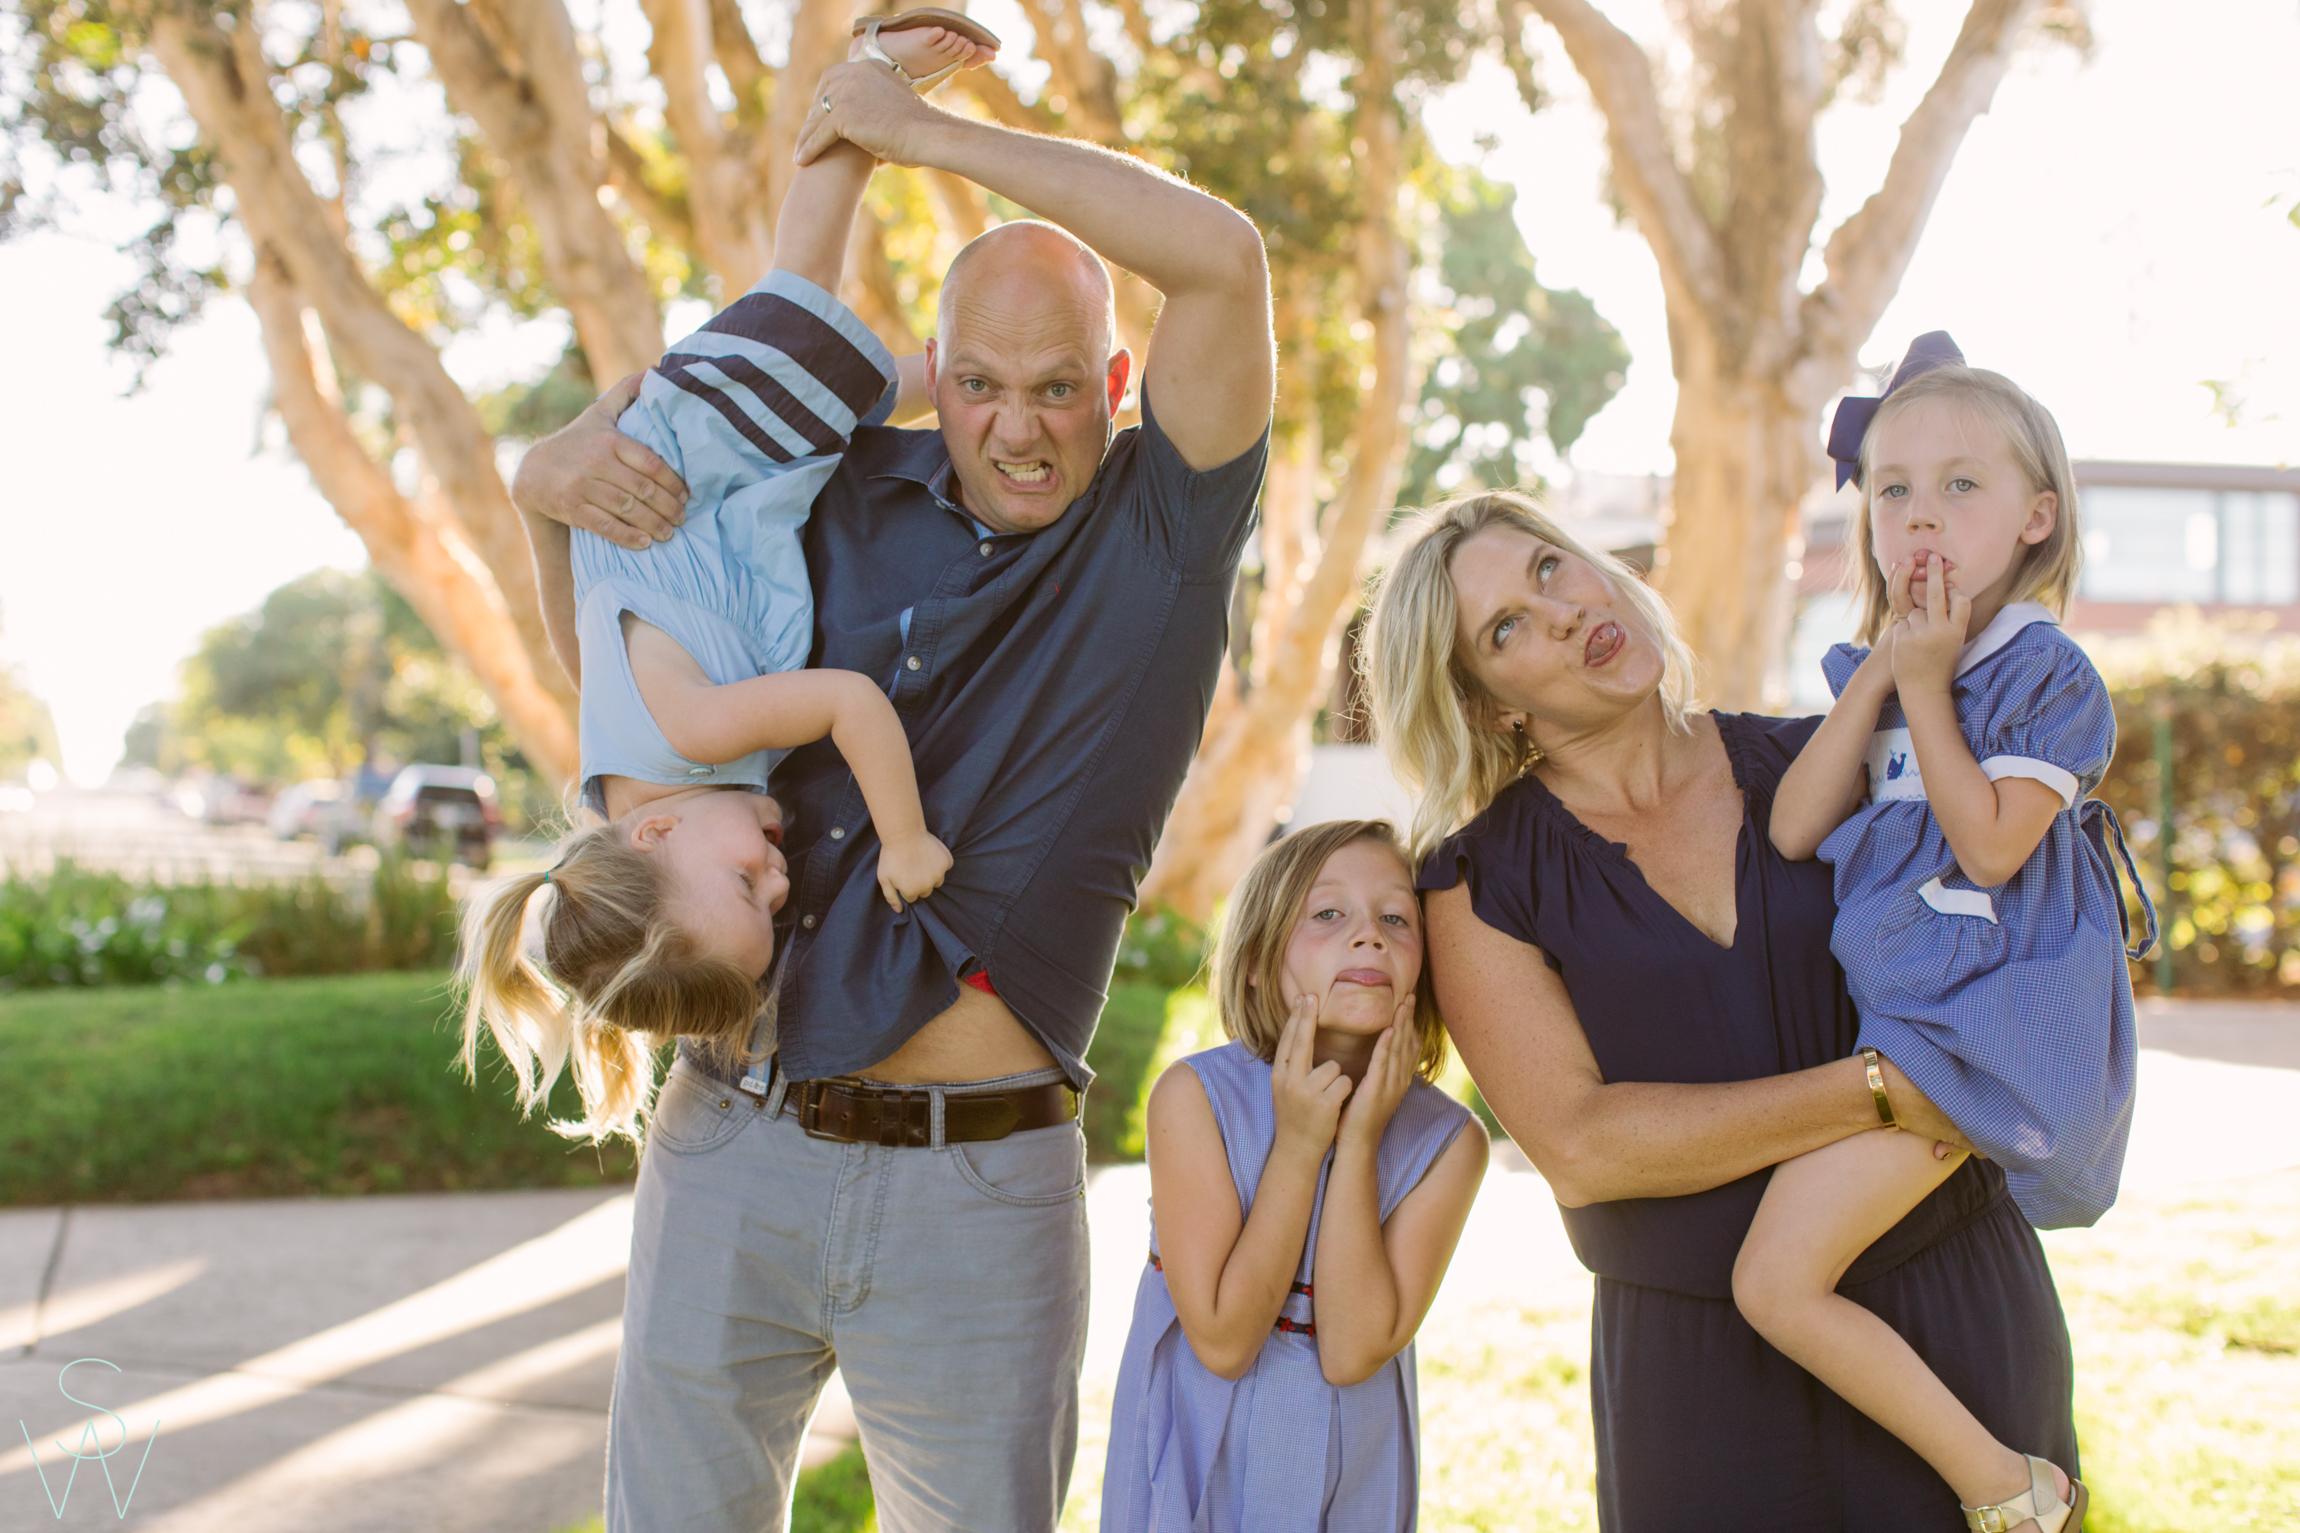 coronado.family.photography.shewanders-32.jpg